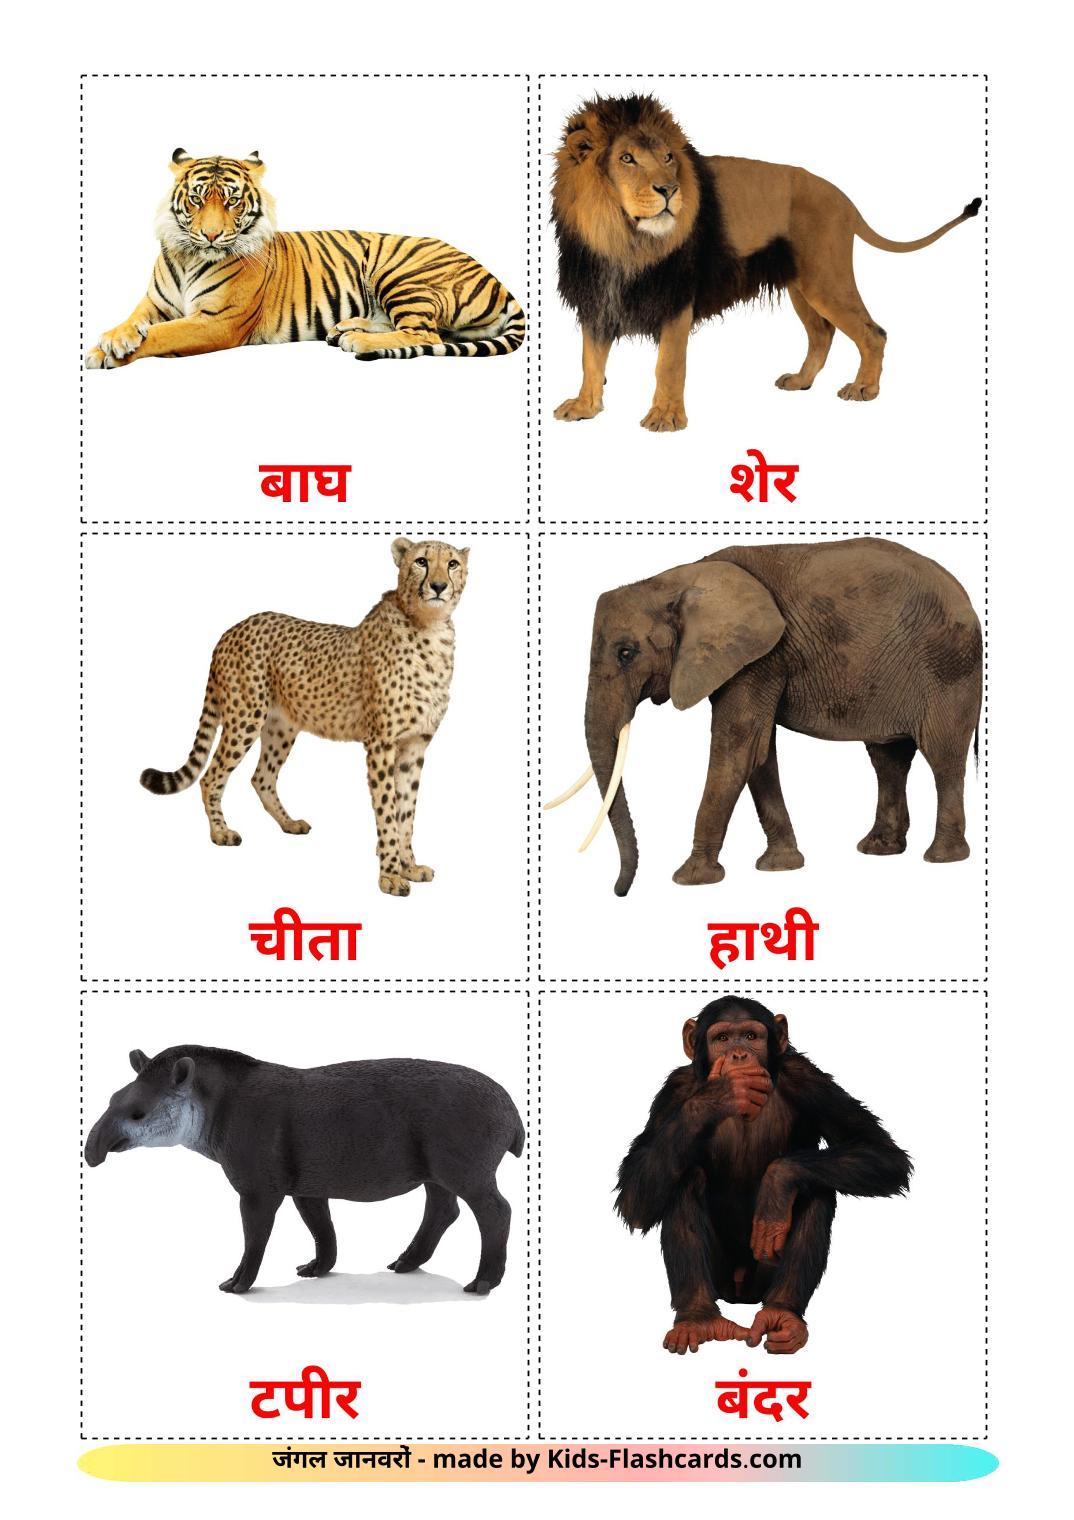 Jungle animals - 21 Free Printable hindi Flashcards